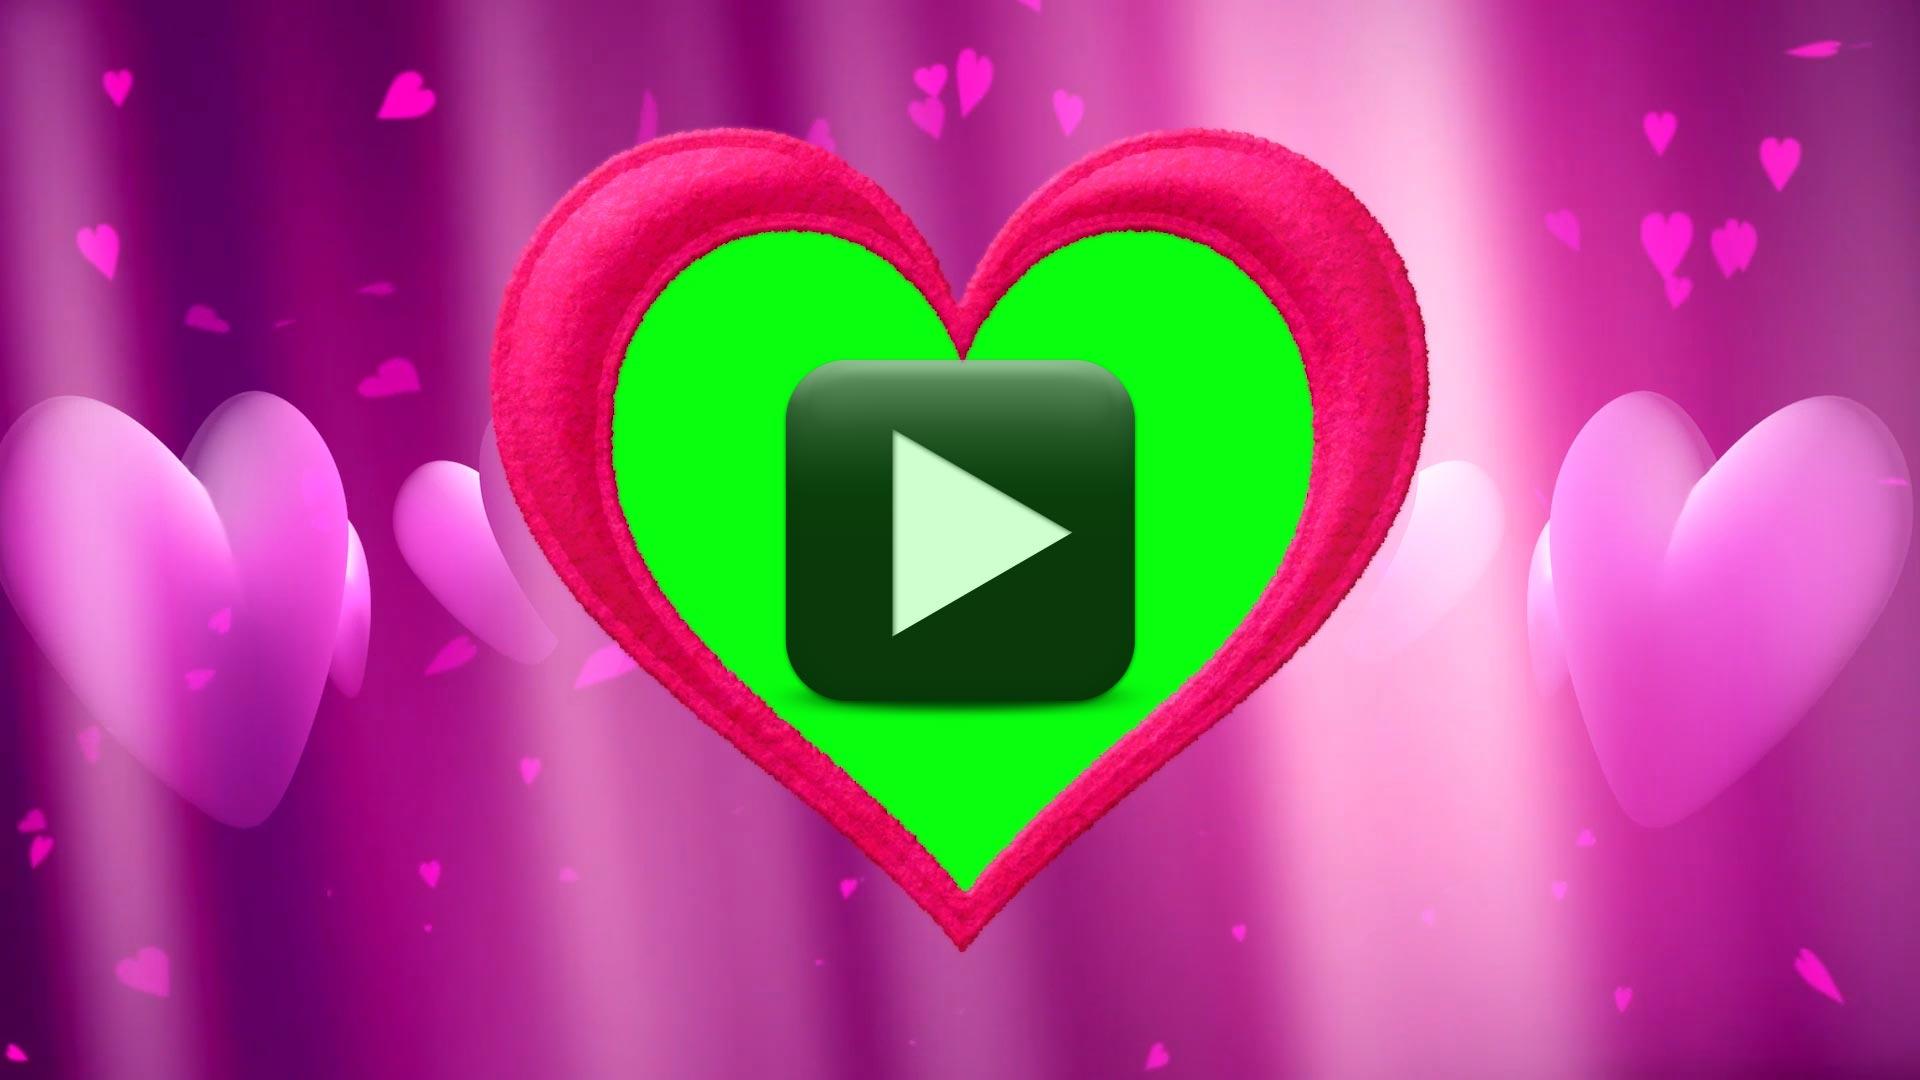 Valentines Day-Wedding Background Video Effects HD 1920x1080p ...